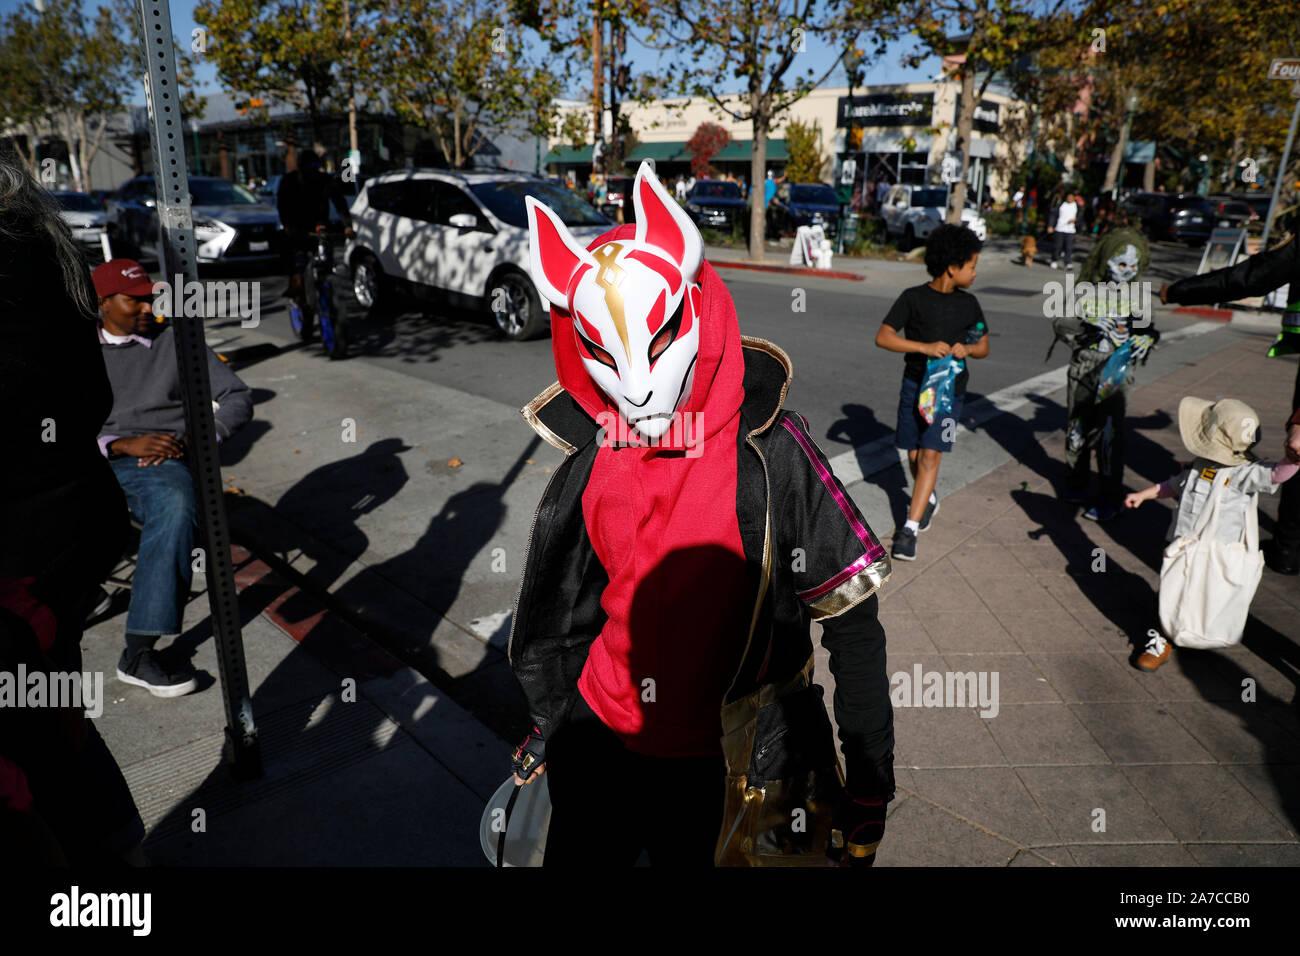 Berkeley California Street High Resolution Stock Photography And